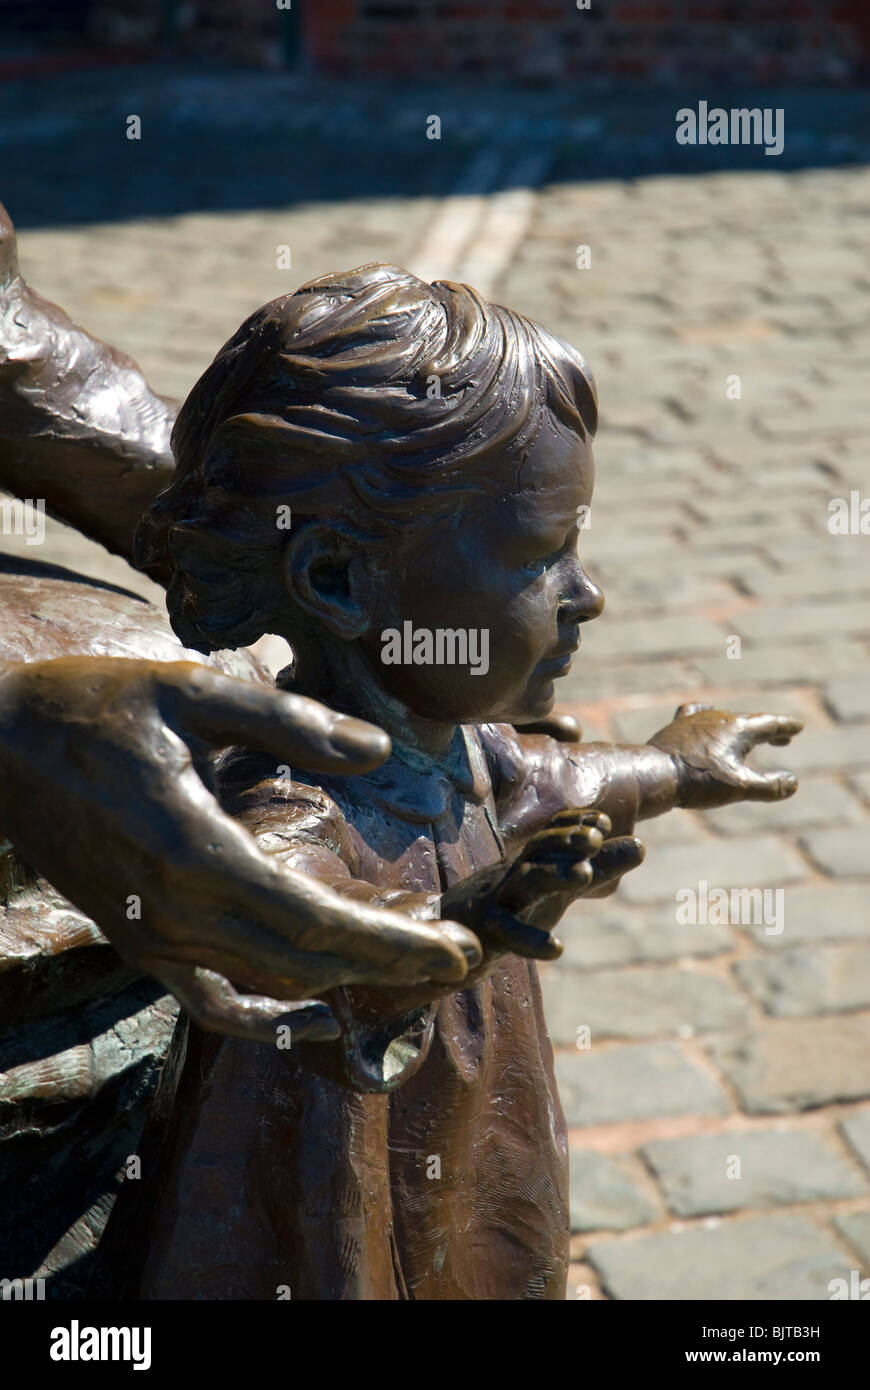 Emigrants. A sculpture by Tony Siebenthaler.  Pier Head, Liverpool, England UK - Stock Image